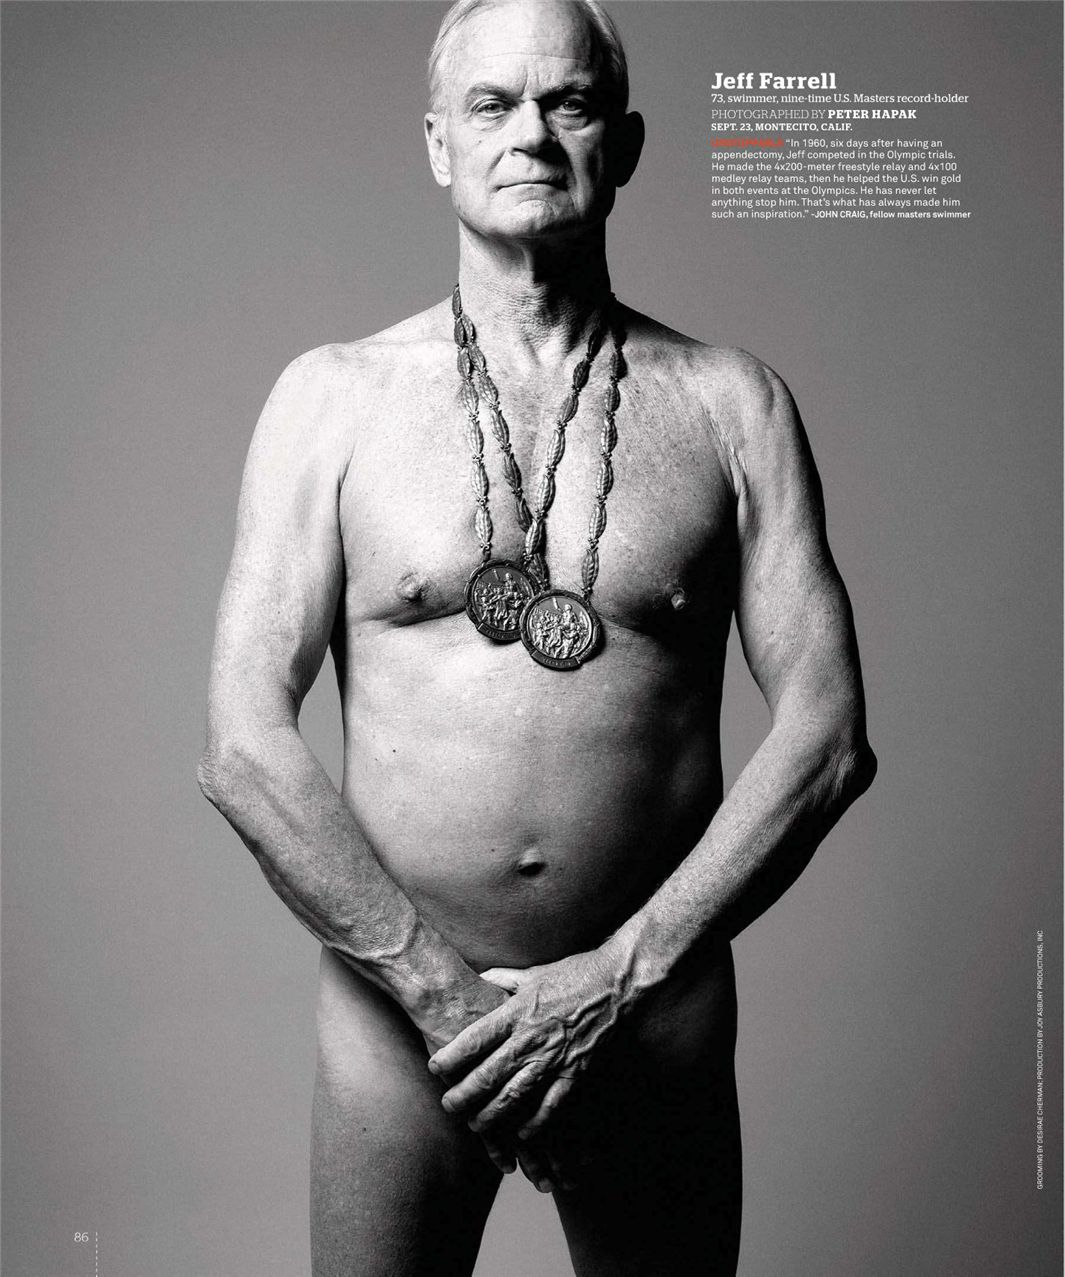 Джефф Фаррелл / Jeff Farrell - ESPN Magazine Body Issue 18 october 2010